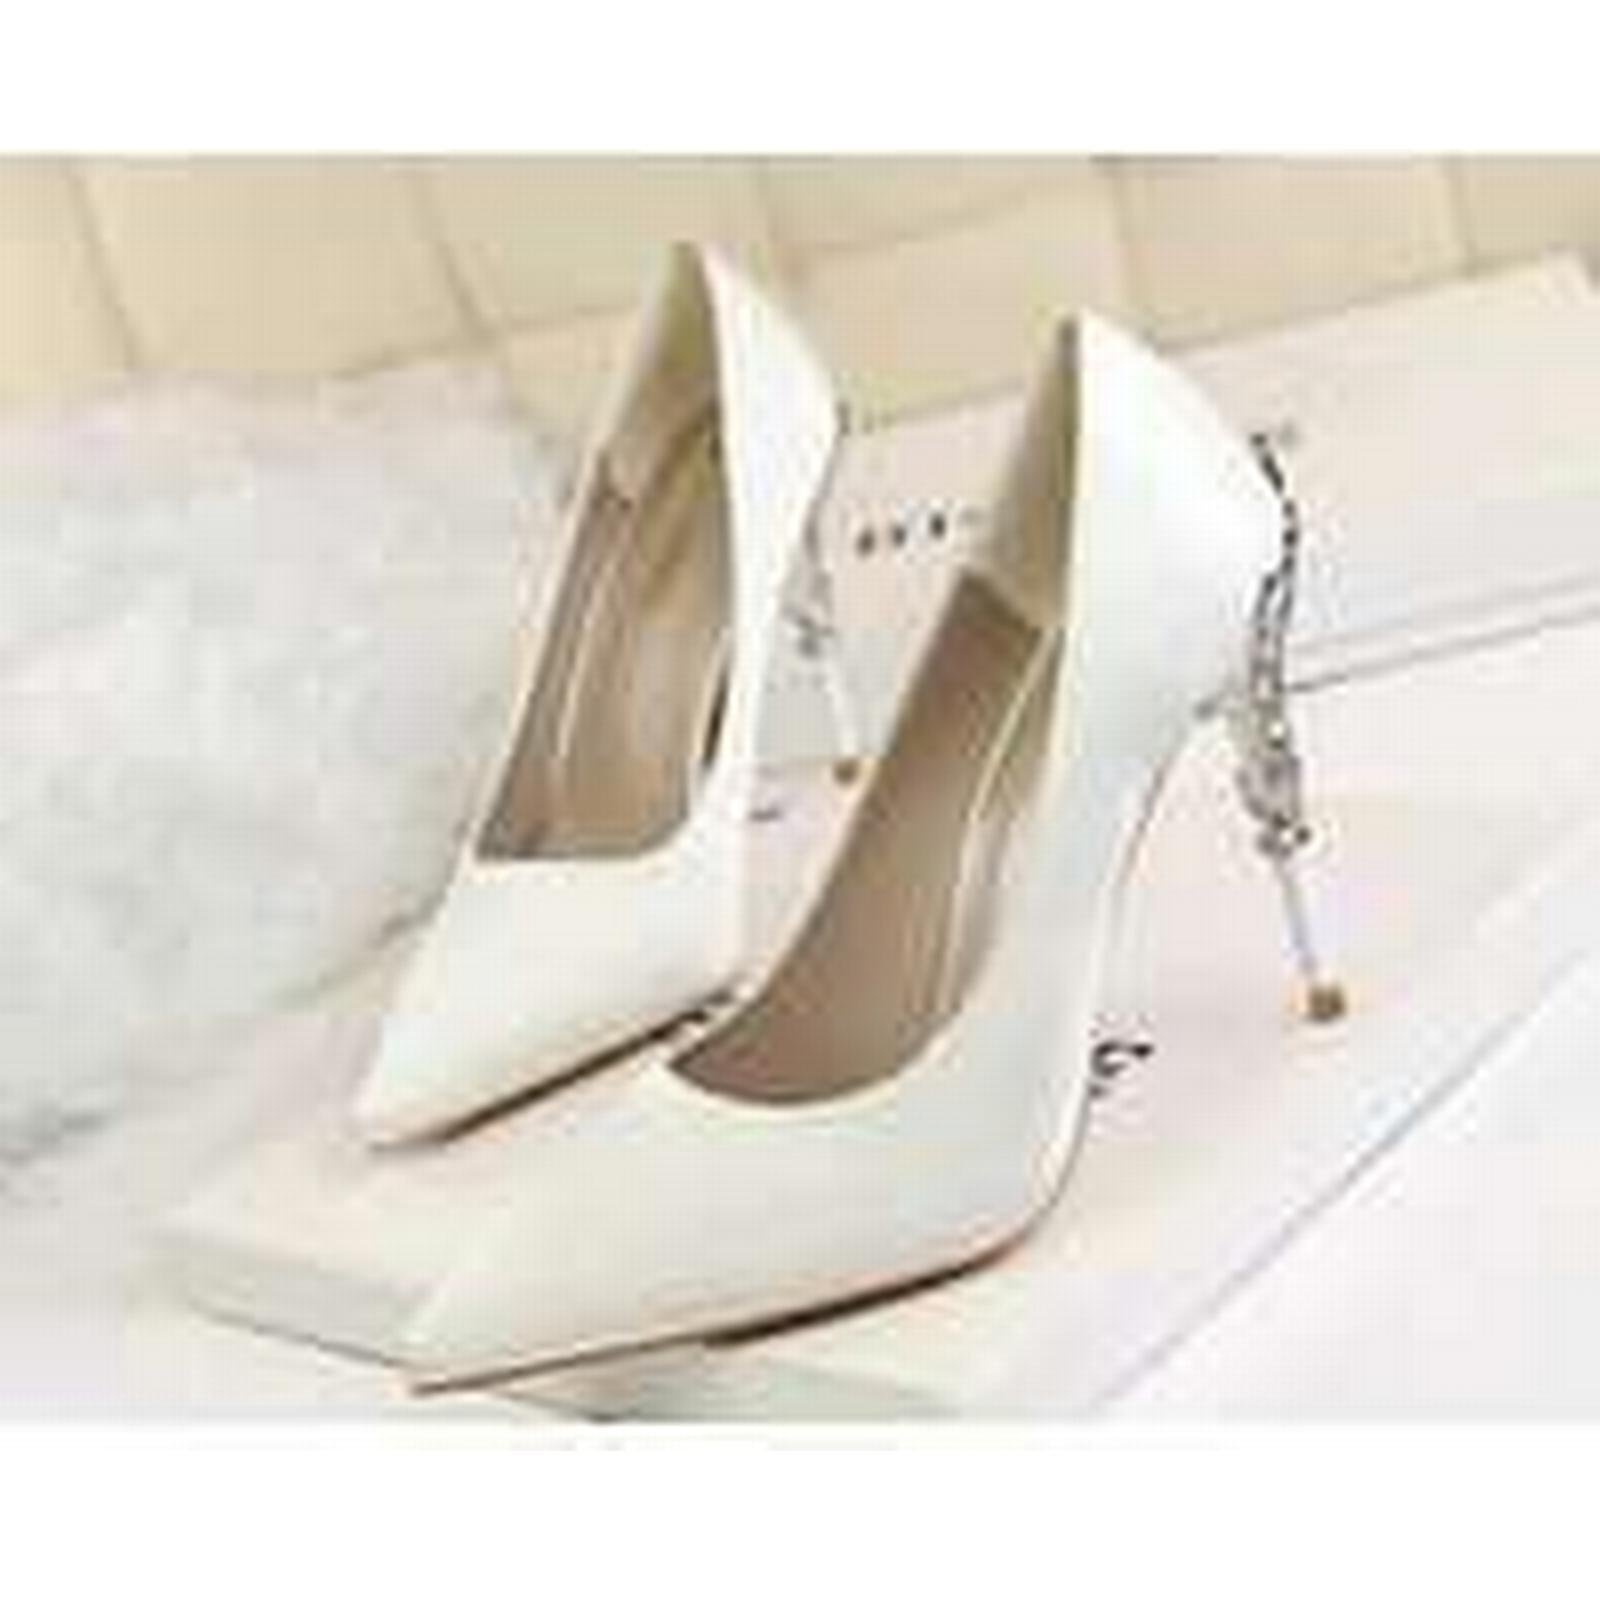 Bonanza (Global) pp338 Excellent pointy pump w 4-8.5, metallic heel,satin surface.US Size 4-8.5, w white 01fa02